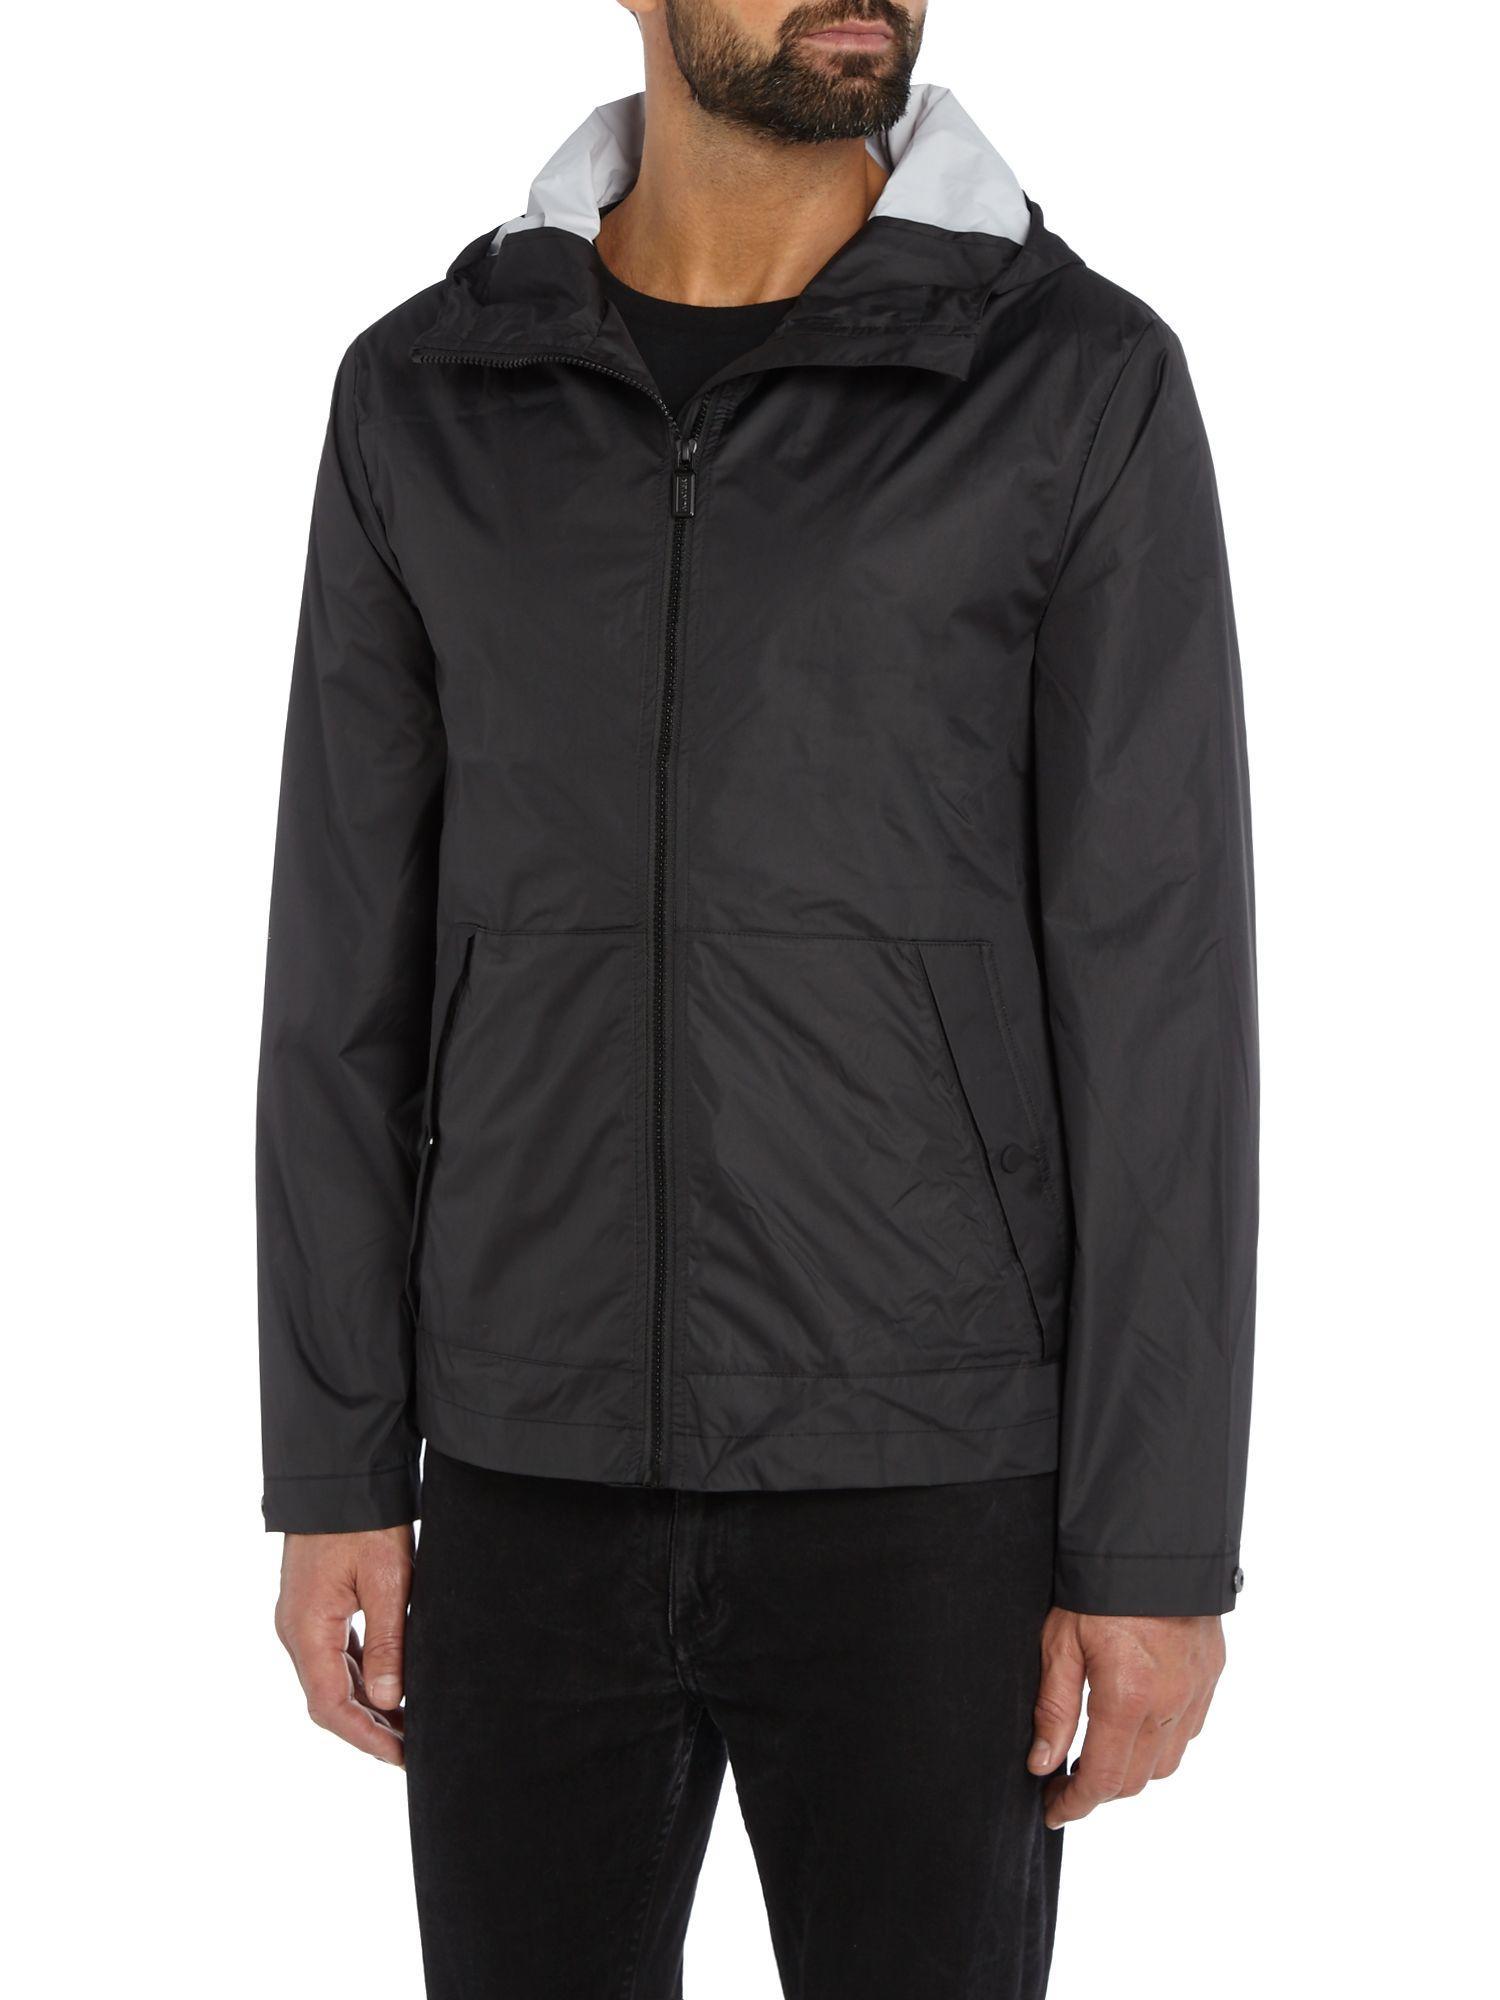 HUNTER Synthetic Blouson Light-weight Jacket in Black for Men